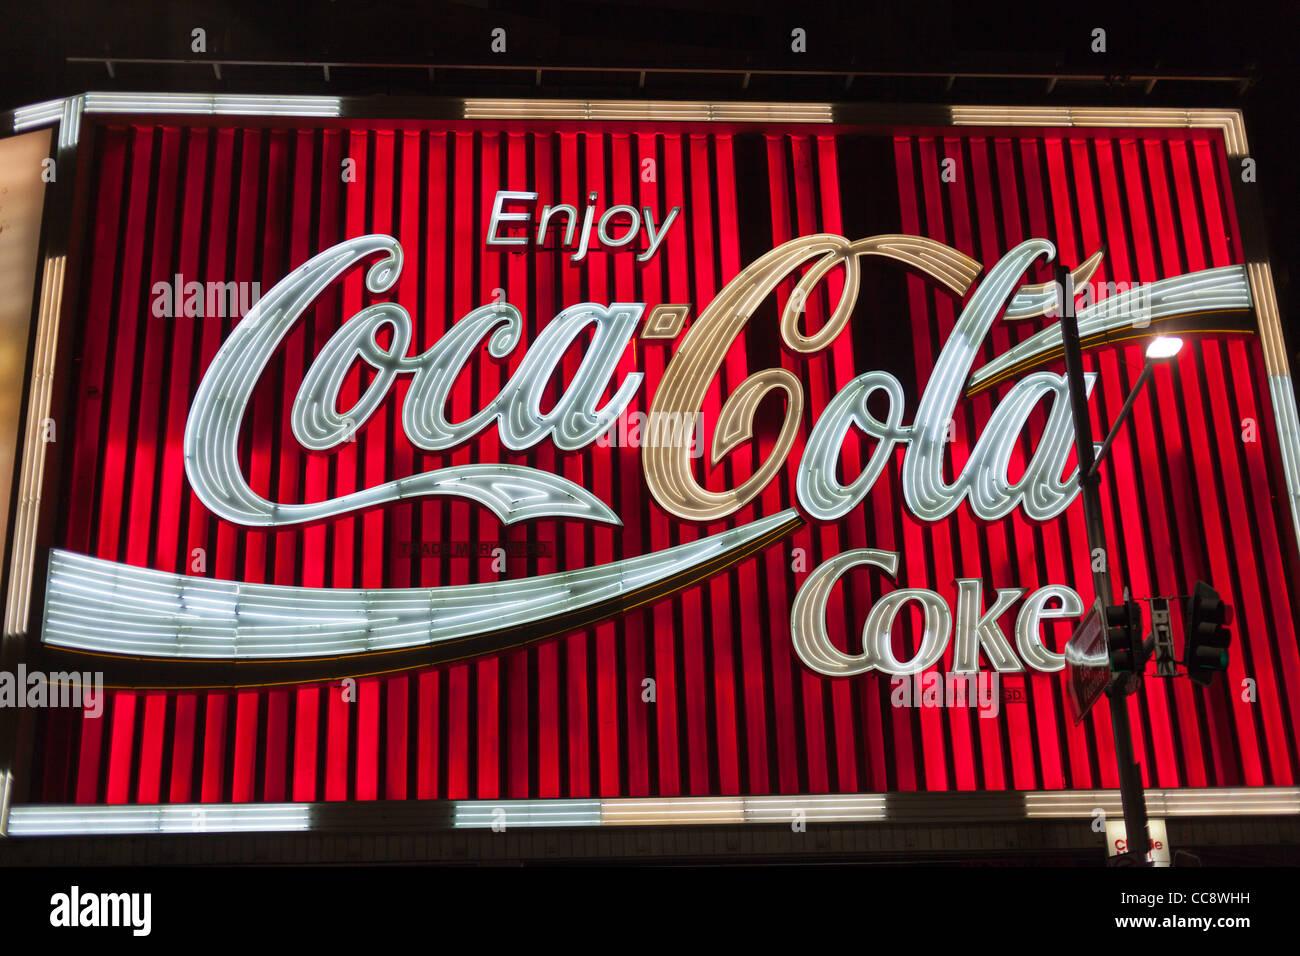 Cocacola Stock Photos Cocacola Stock Images Alamy